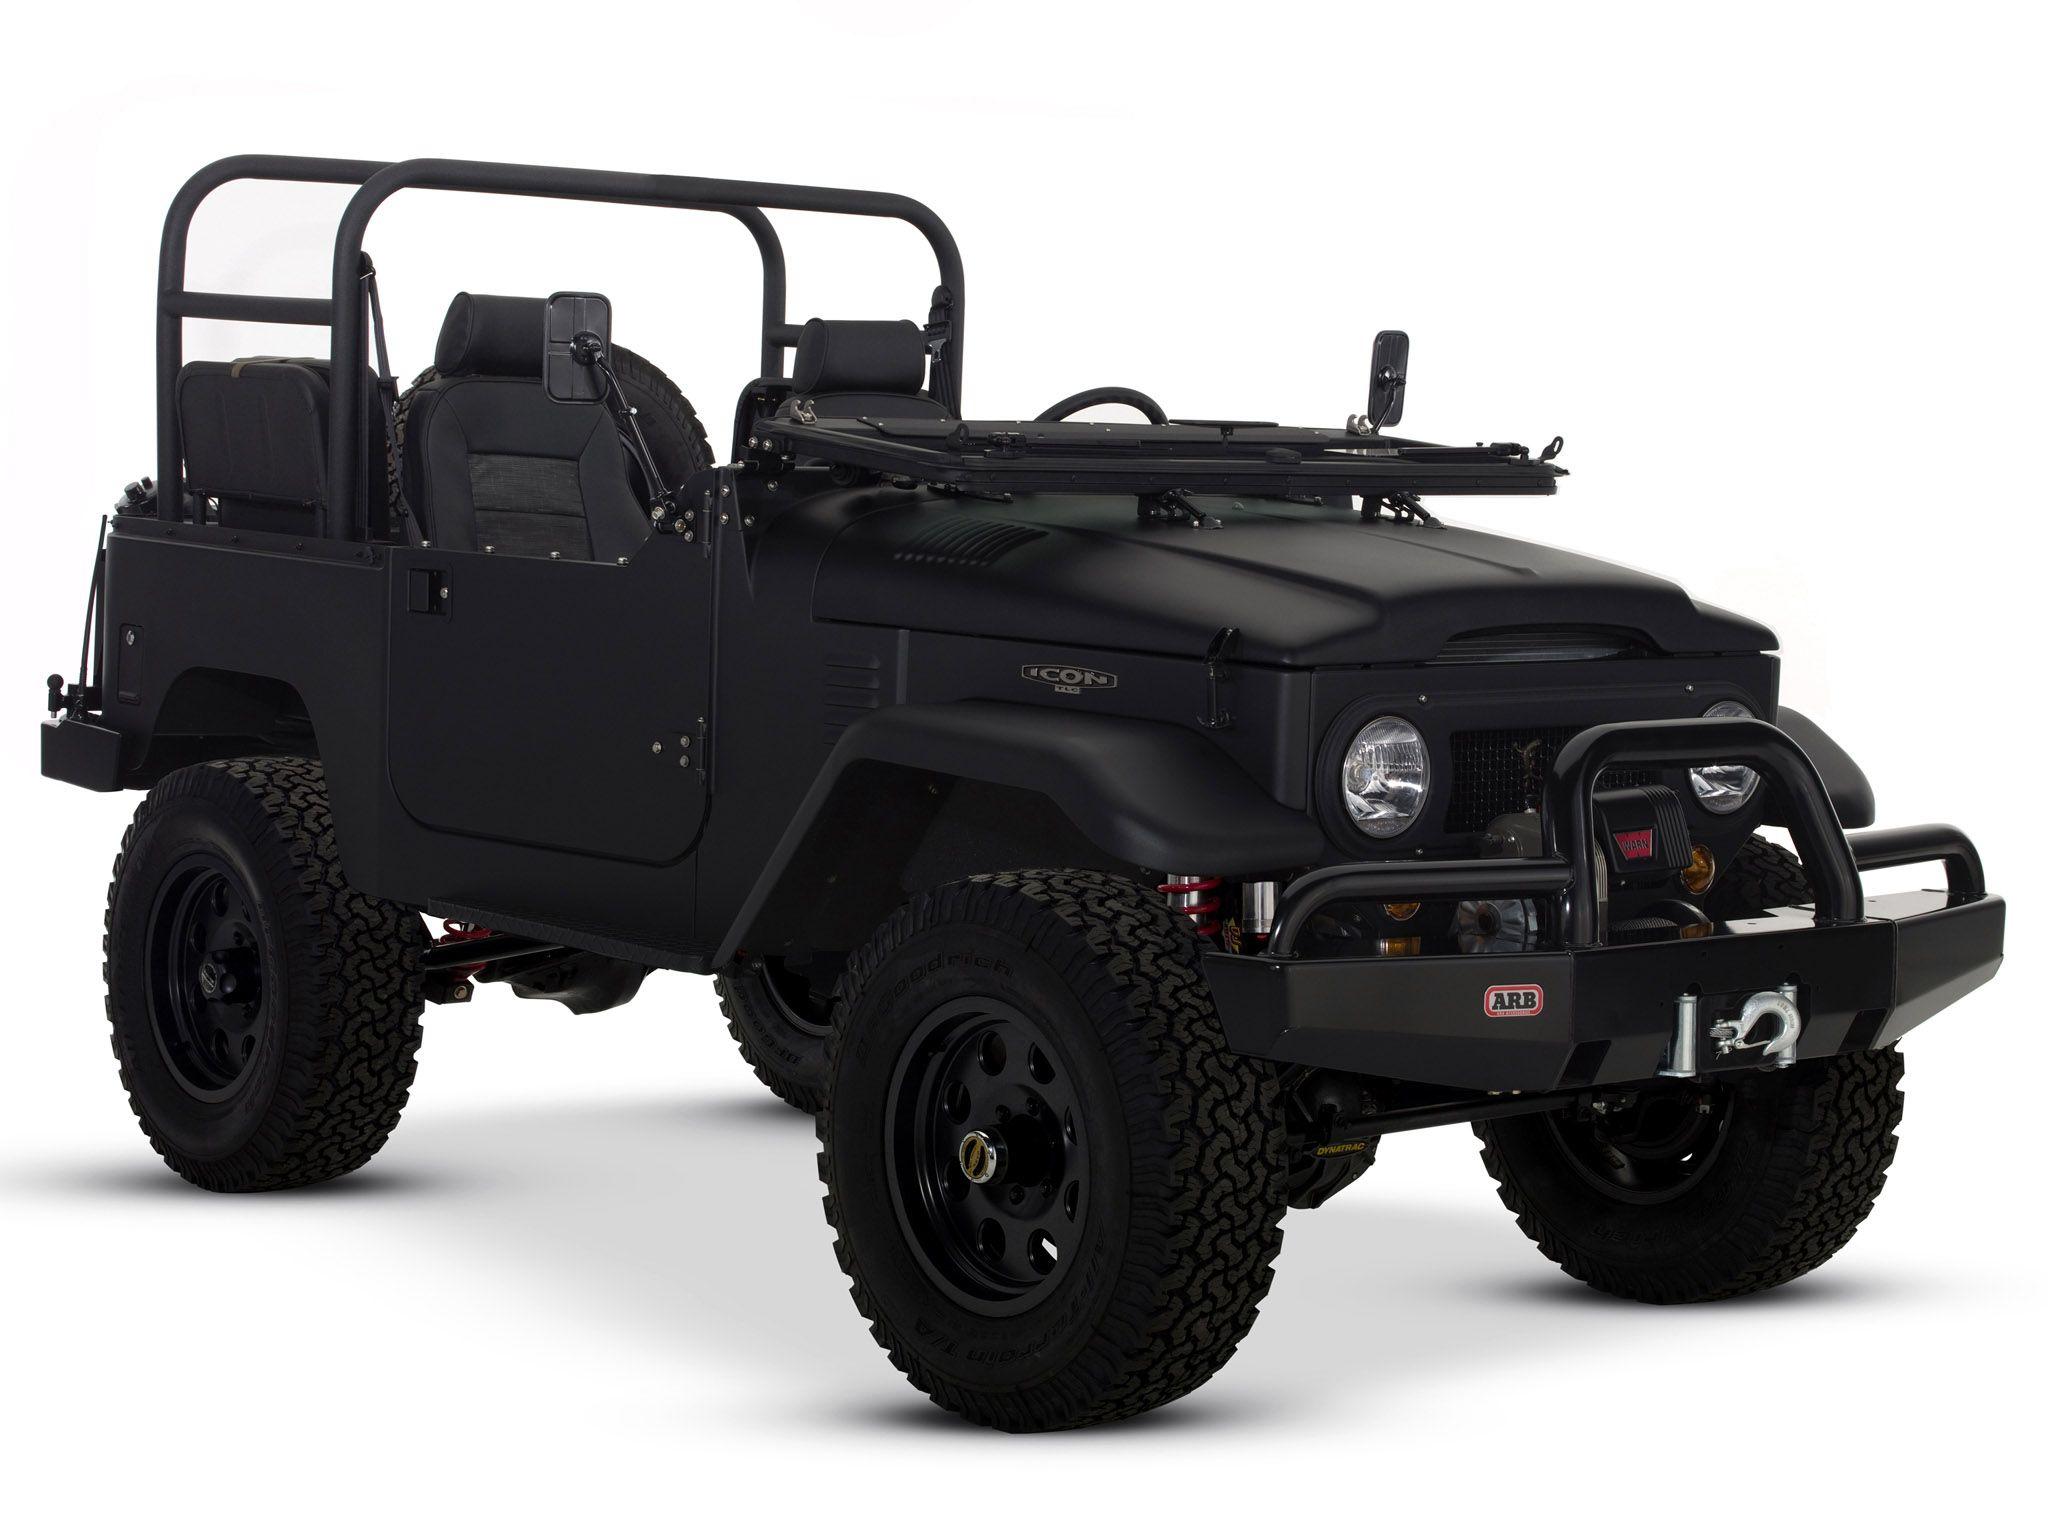 The ICON FJ40 | motors | Coche porsche, Accesorios para jeep